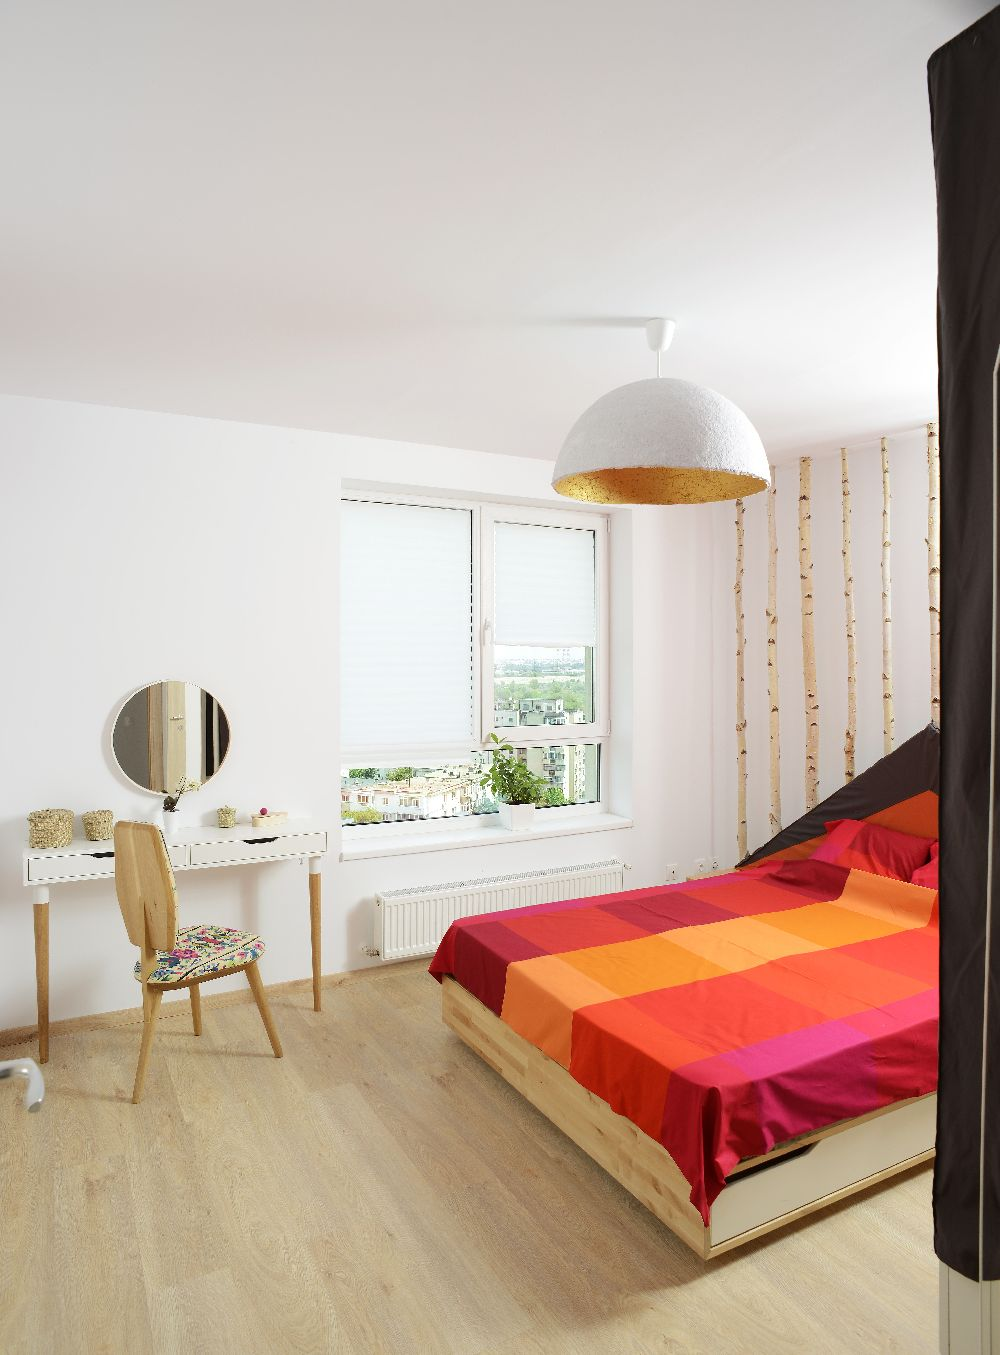 adelaparvu.com despre amenajare apartament 4 camere The Park, designeri Mihnea Ghildus si Marilena Popa (32)